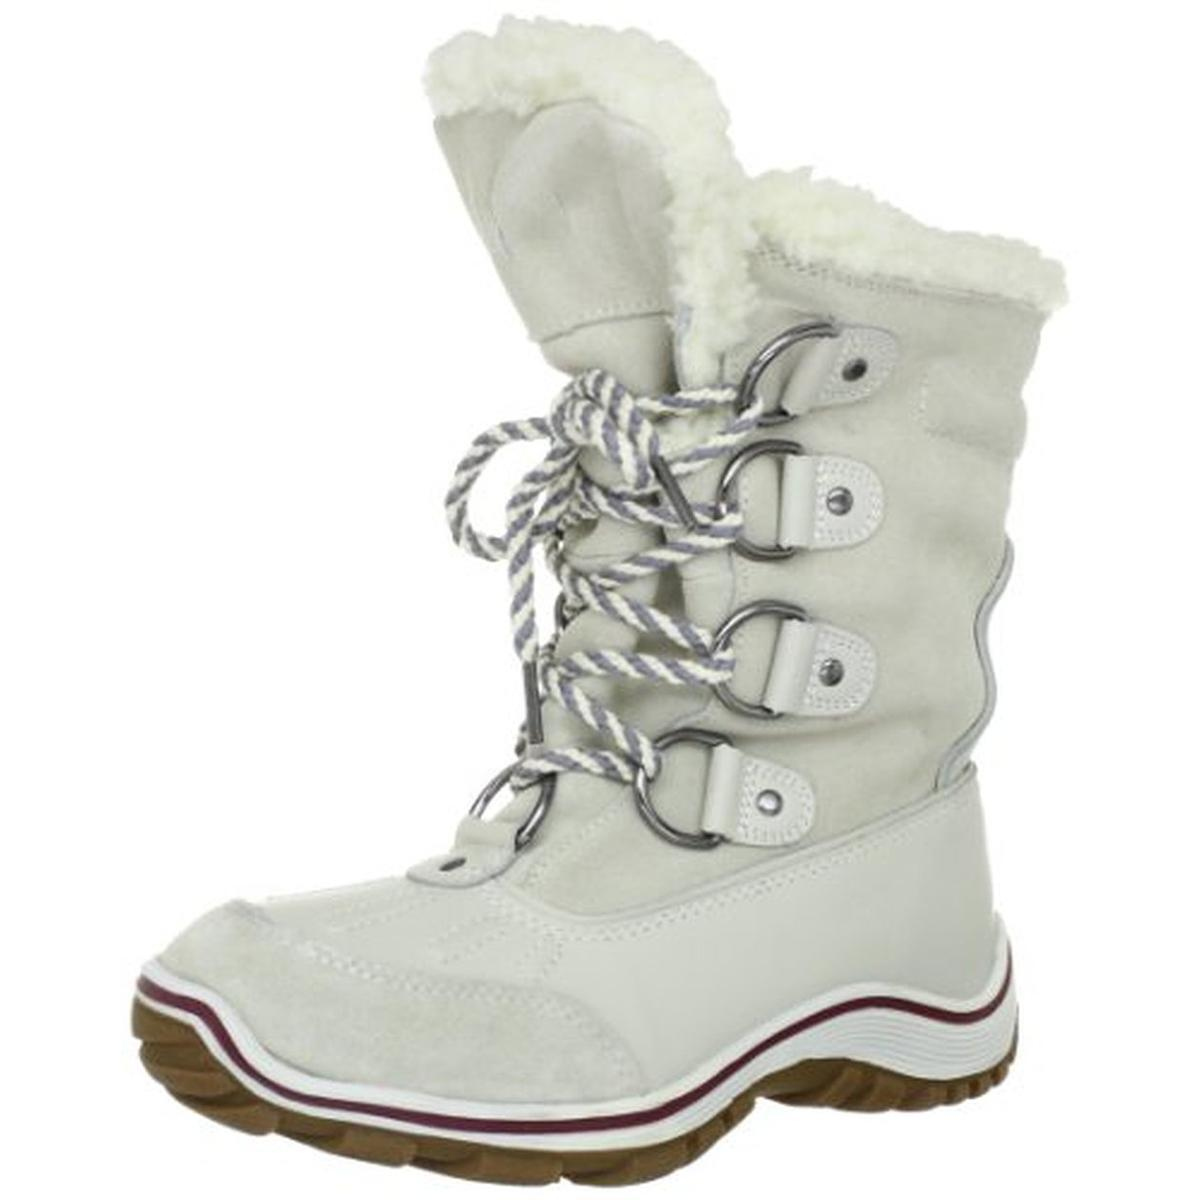 PAJAR ALINA WOMEN WHITE ICE LEATHER SUEDE WATERPROOF WINTER SNOW BOOT SZ 39  8